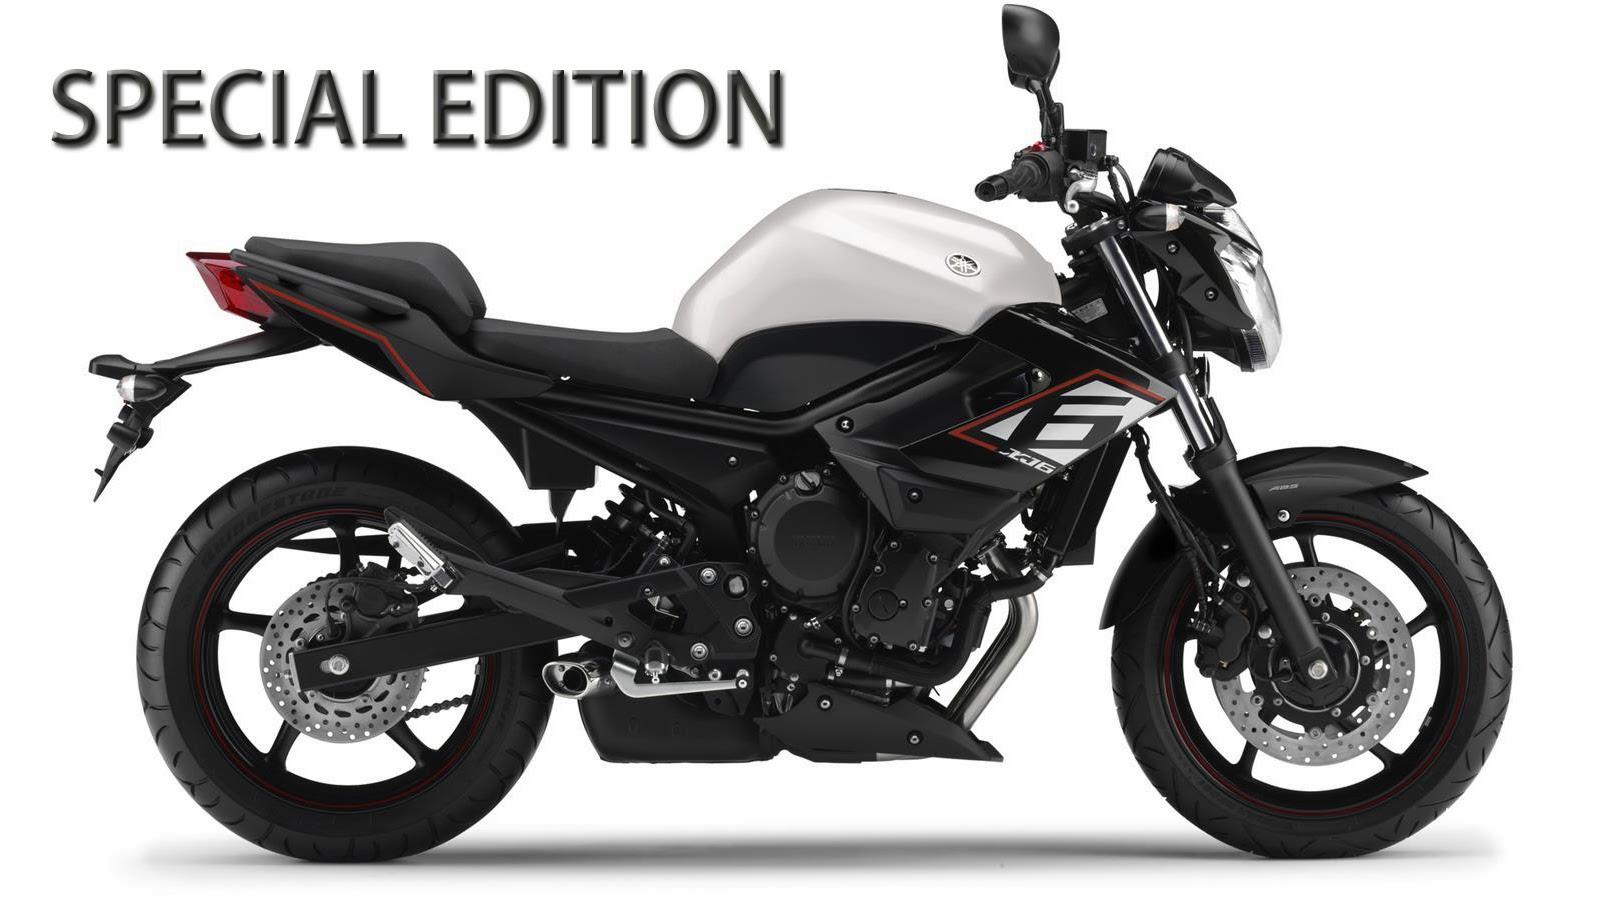 Ducati monster, yamaha xj6 o honda cb500f - ForoCoches